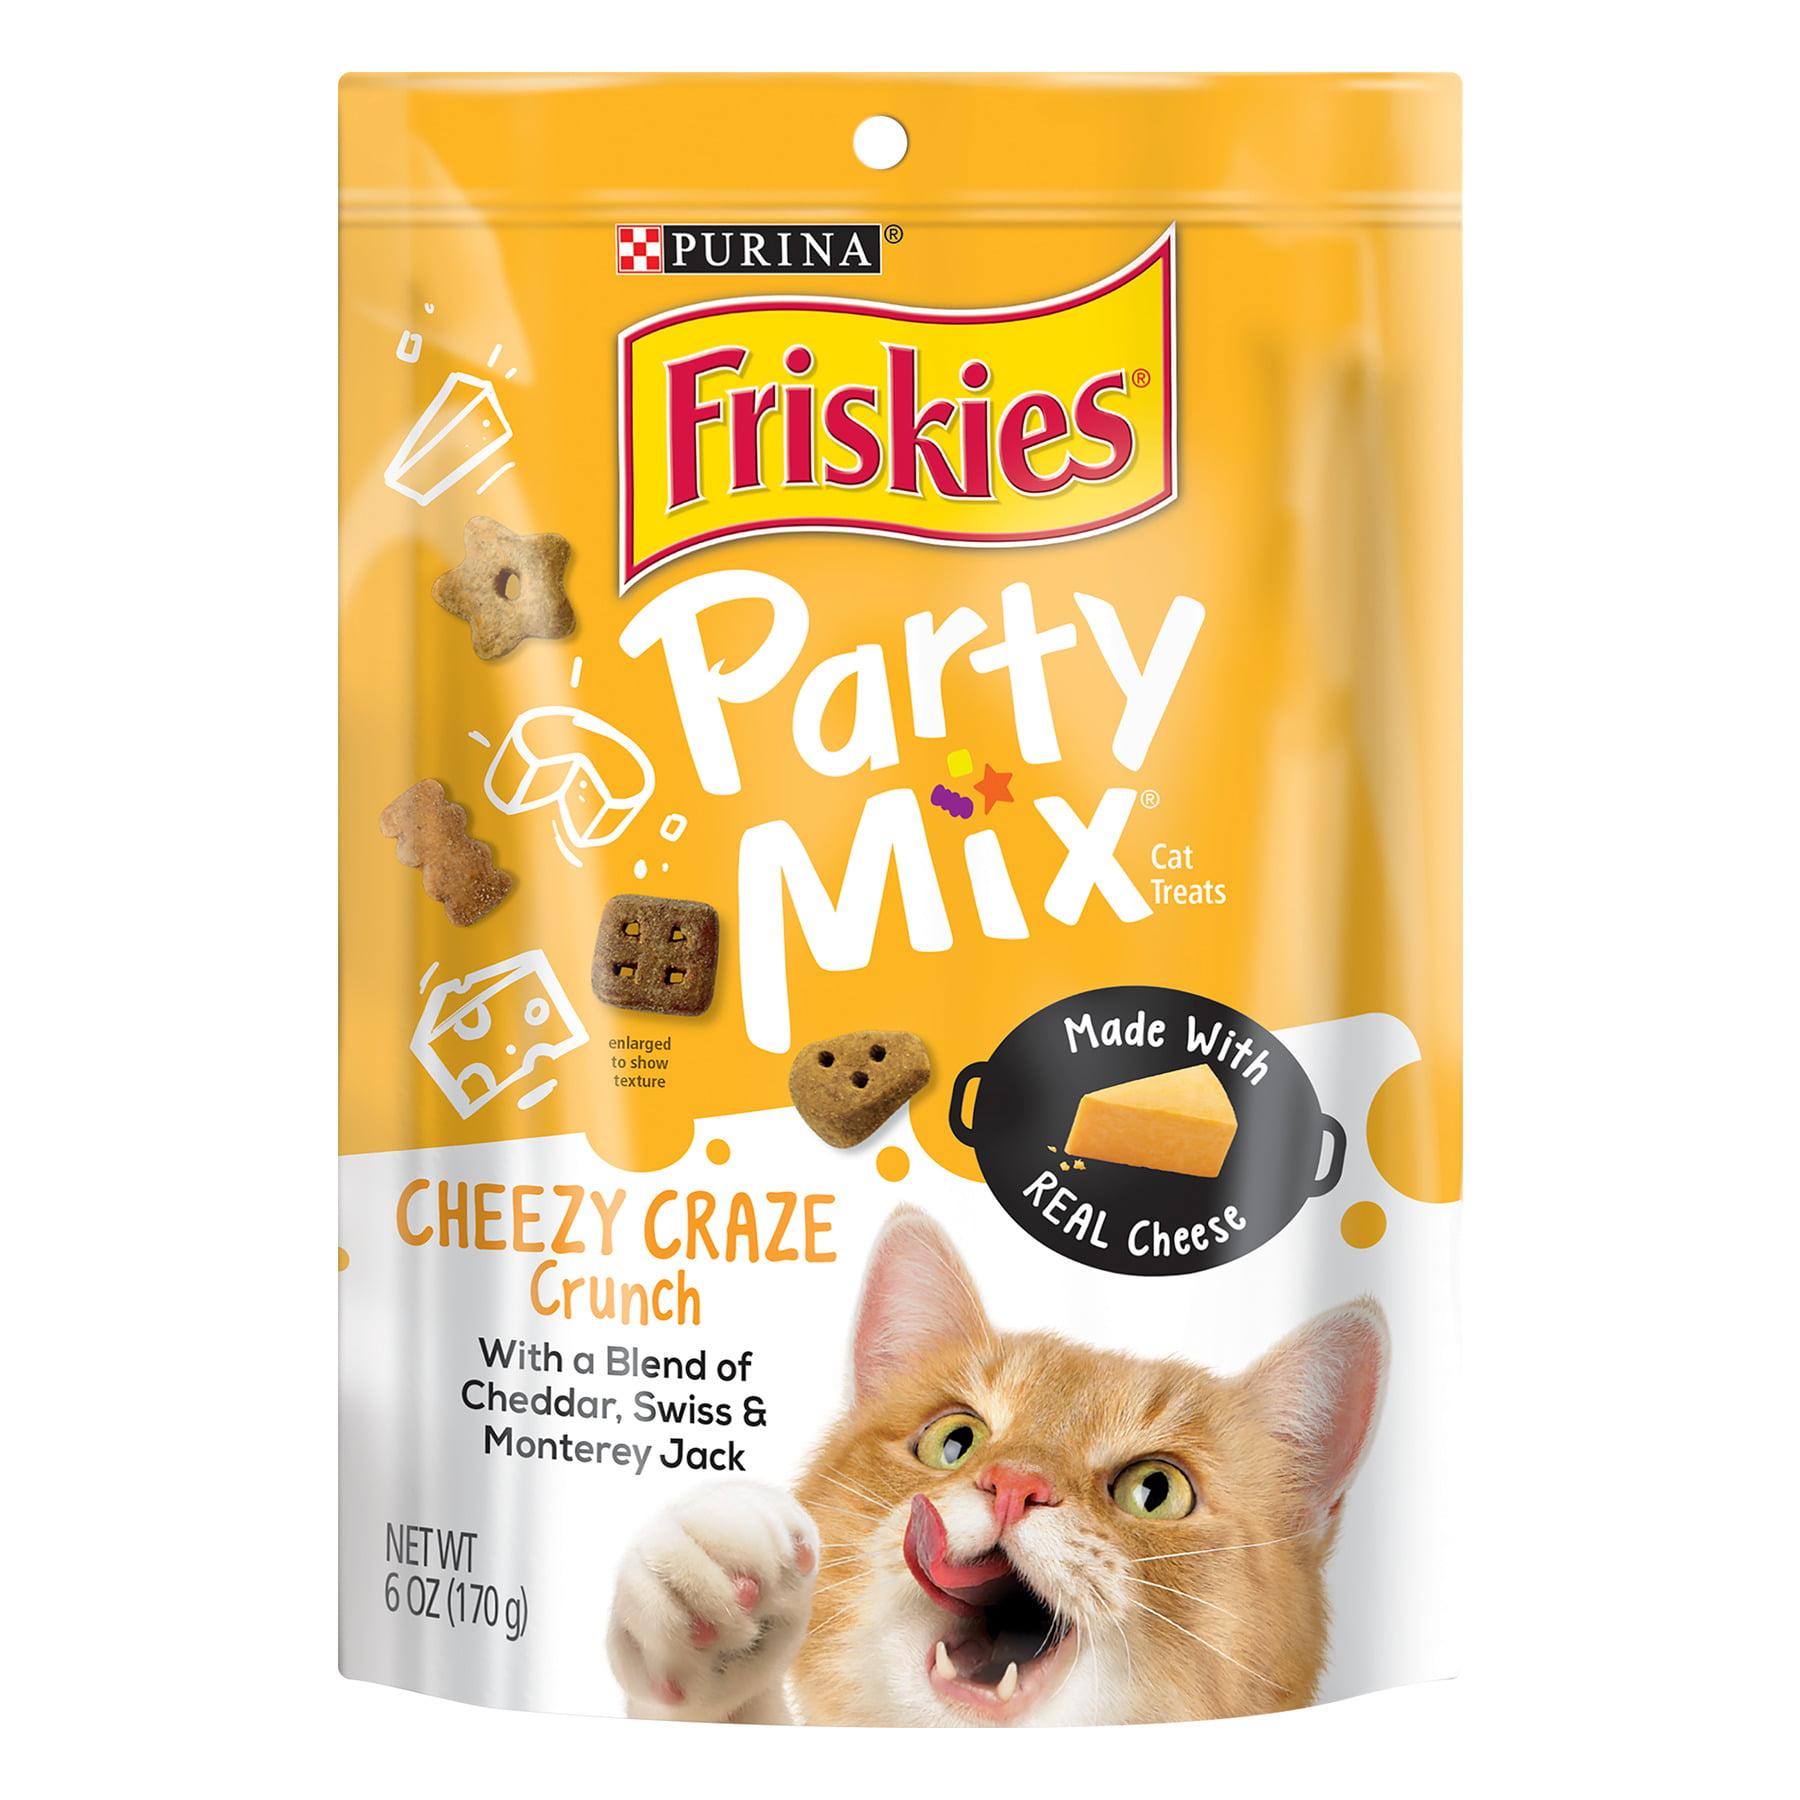 (2 Pack) Purina Friskies Party Mix Crunch Cheezy Craze Cat Treats, 6 oz